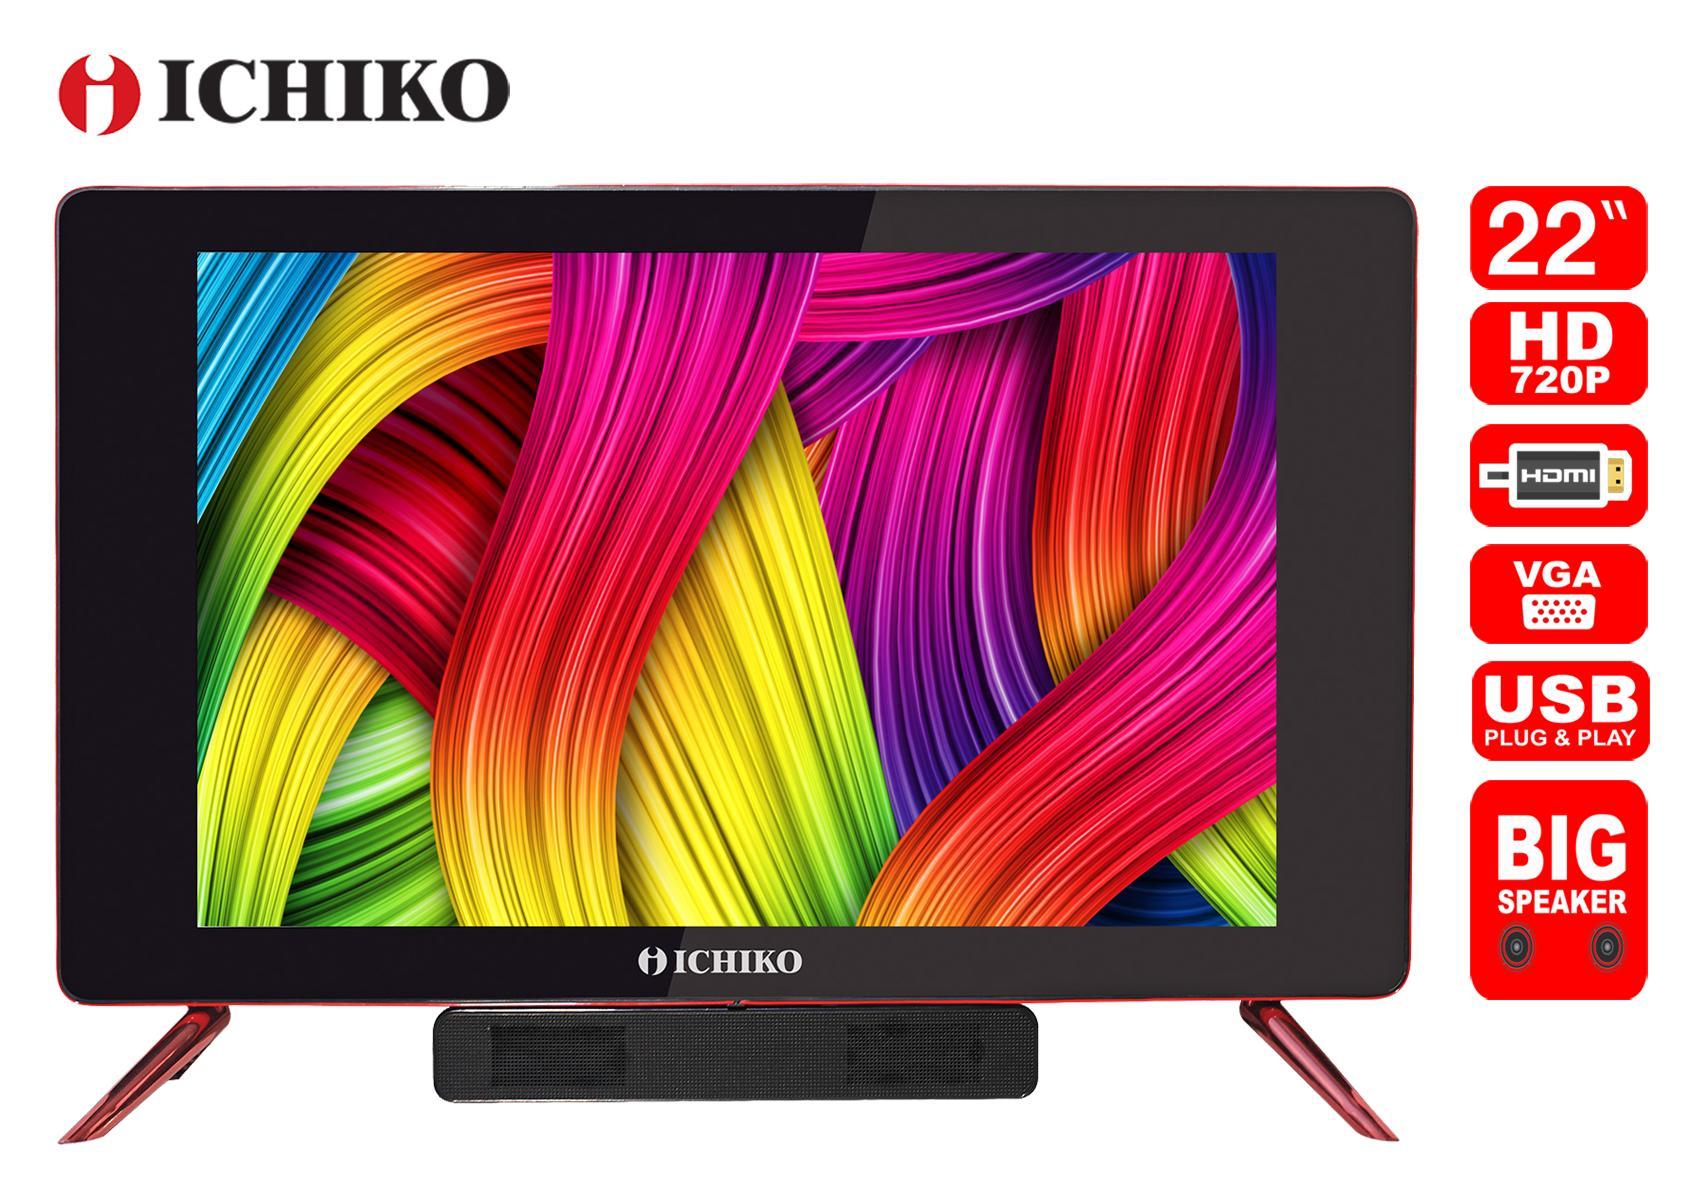 Ichiko Televisi LED 22 Inch HD Tipe S2219